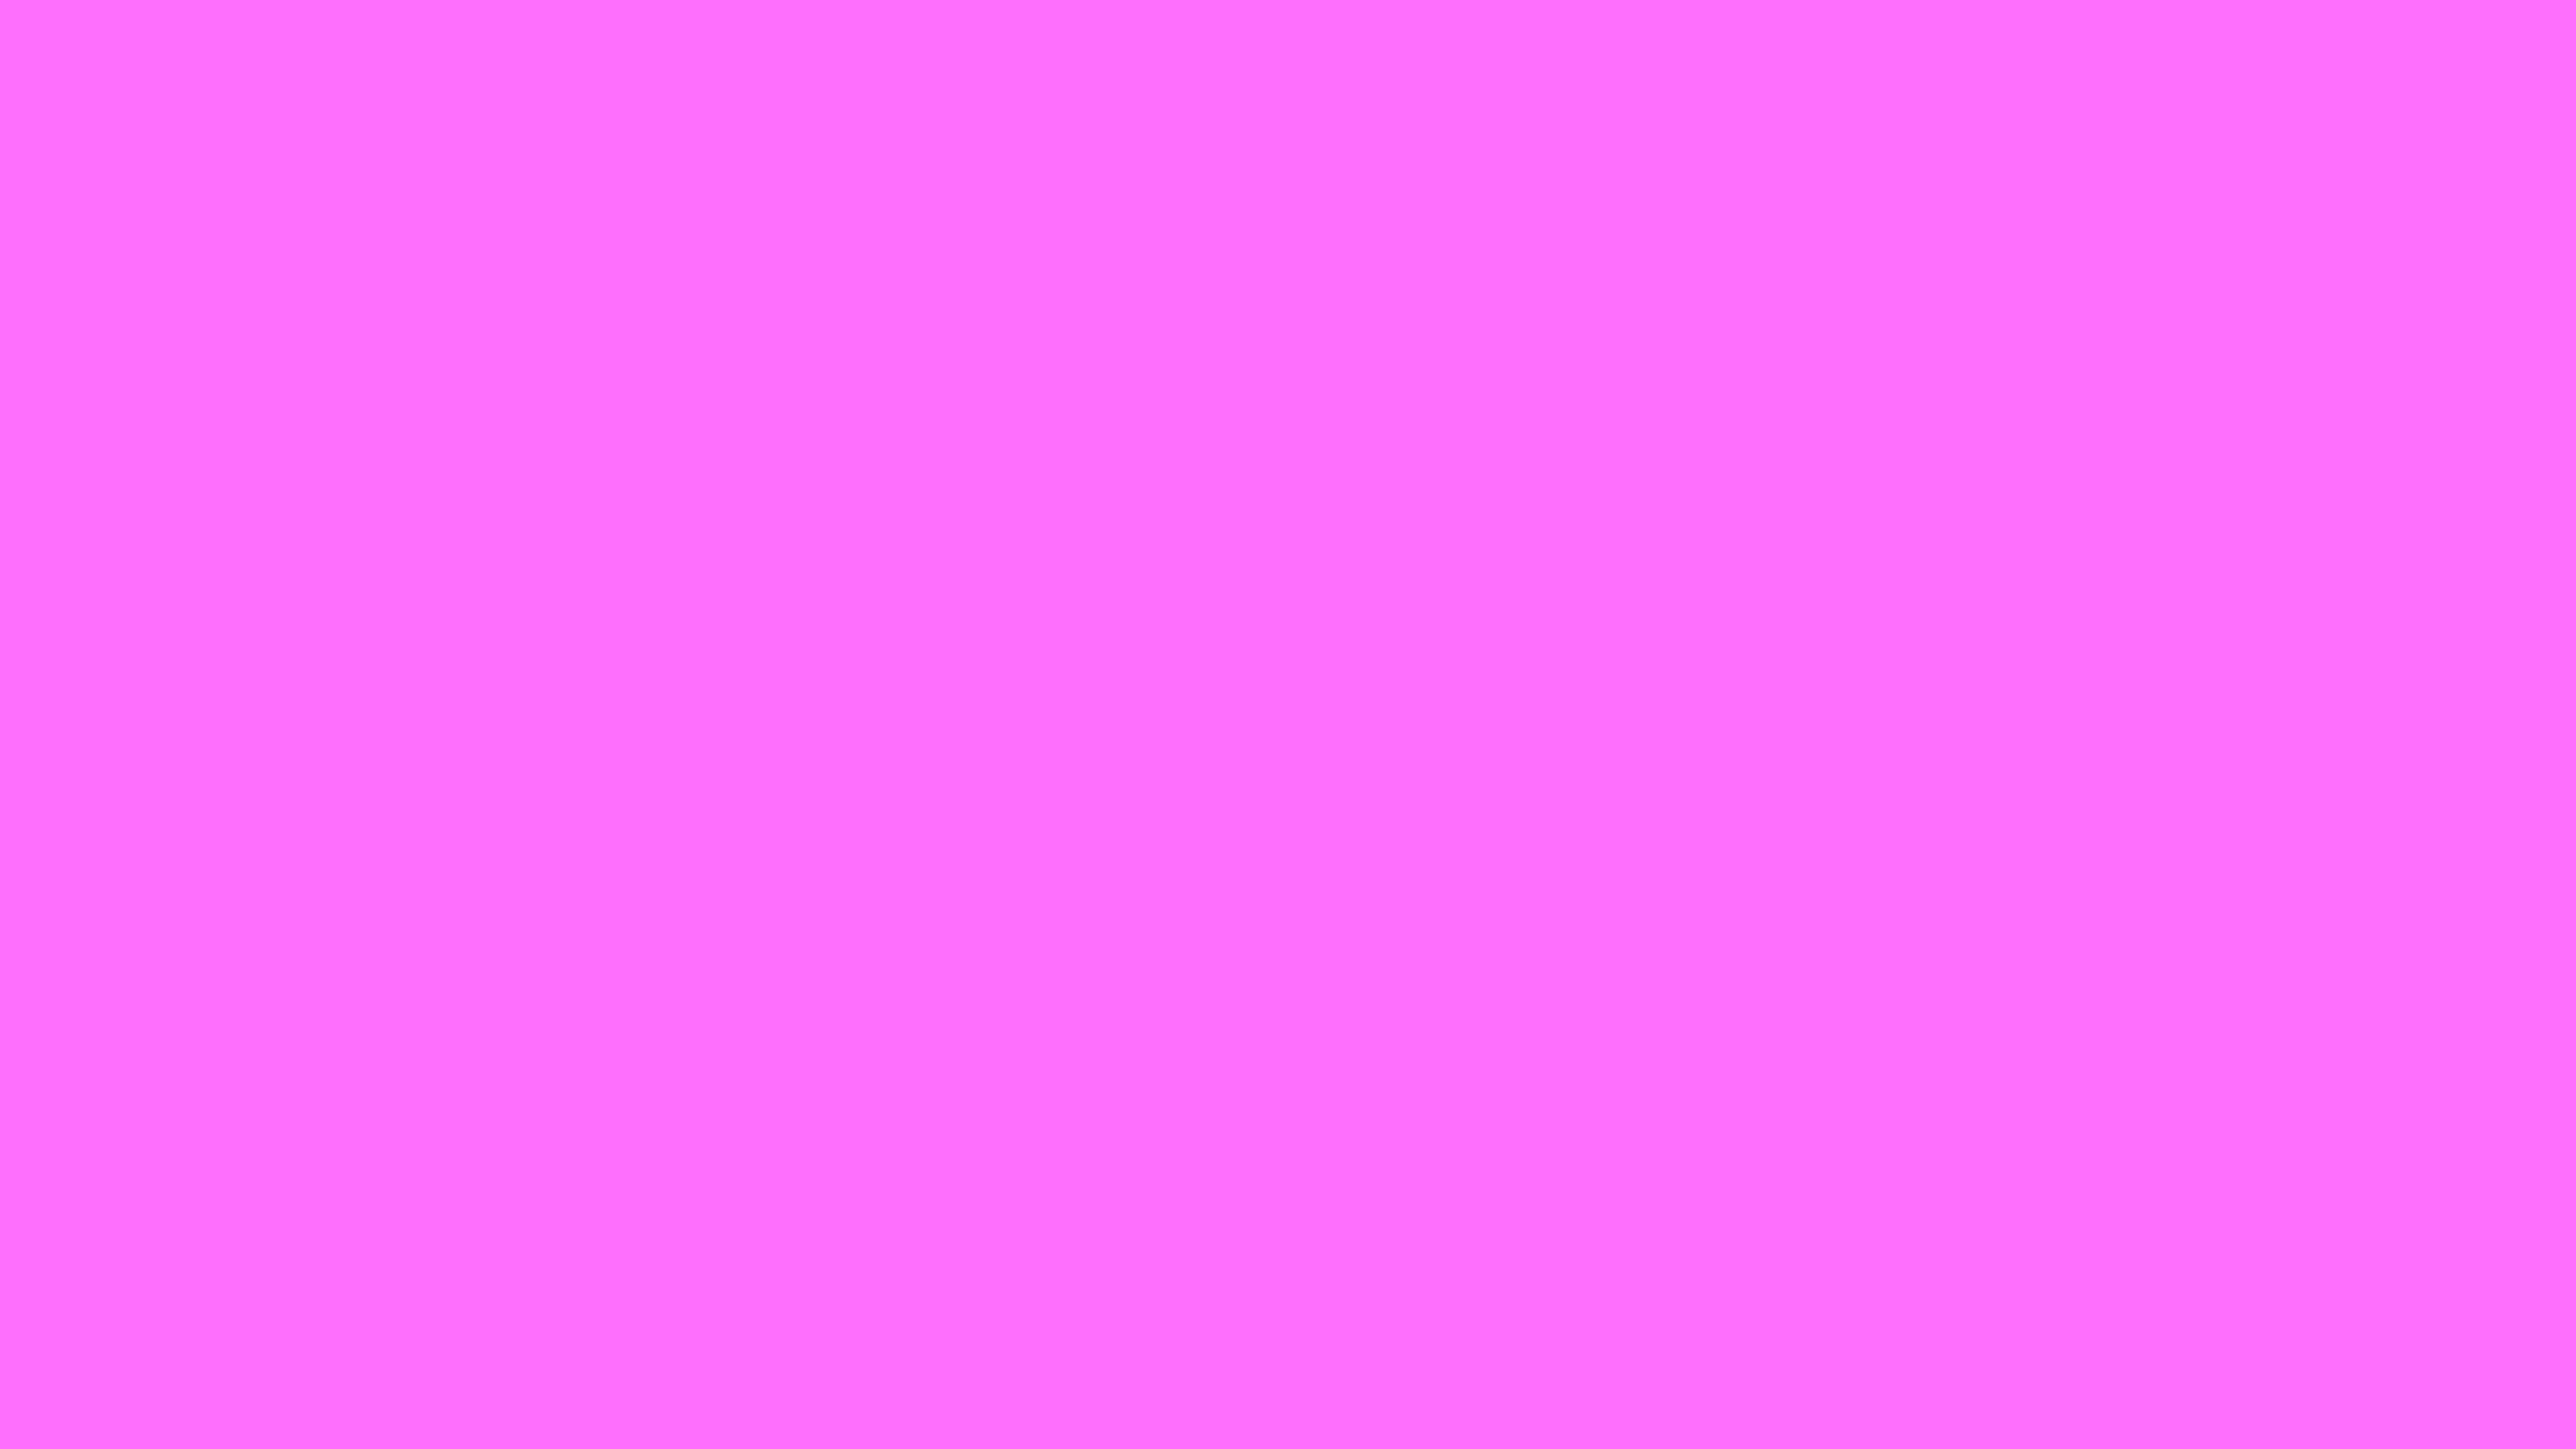 4096x2304 Shocking Pink Crayola Solid Color Background